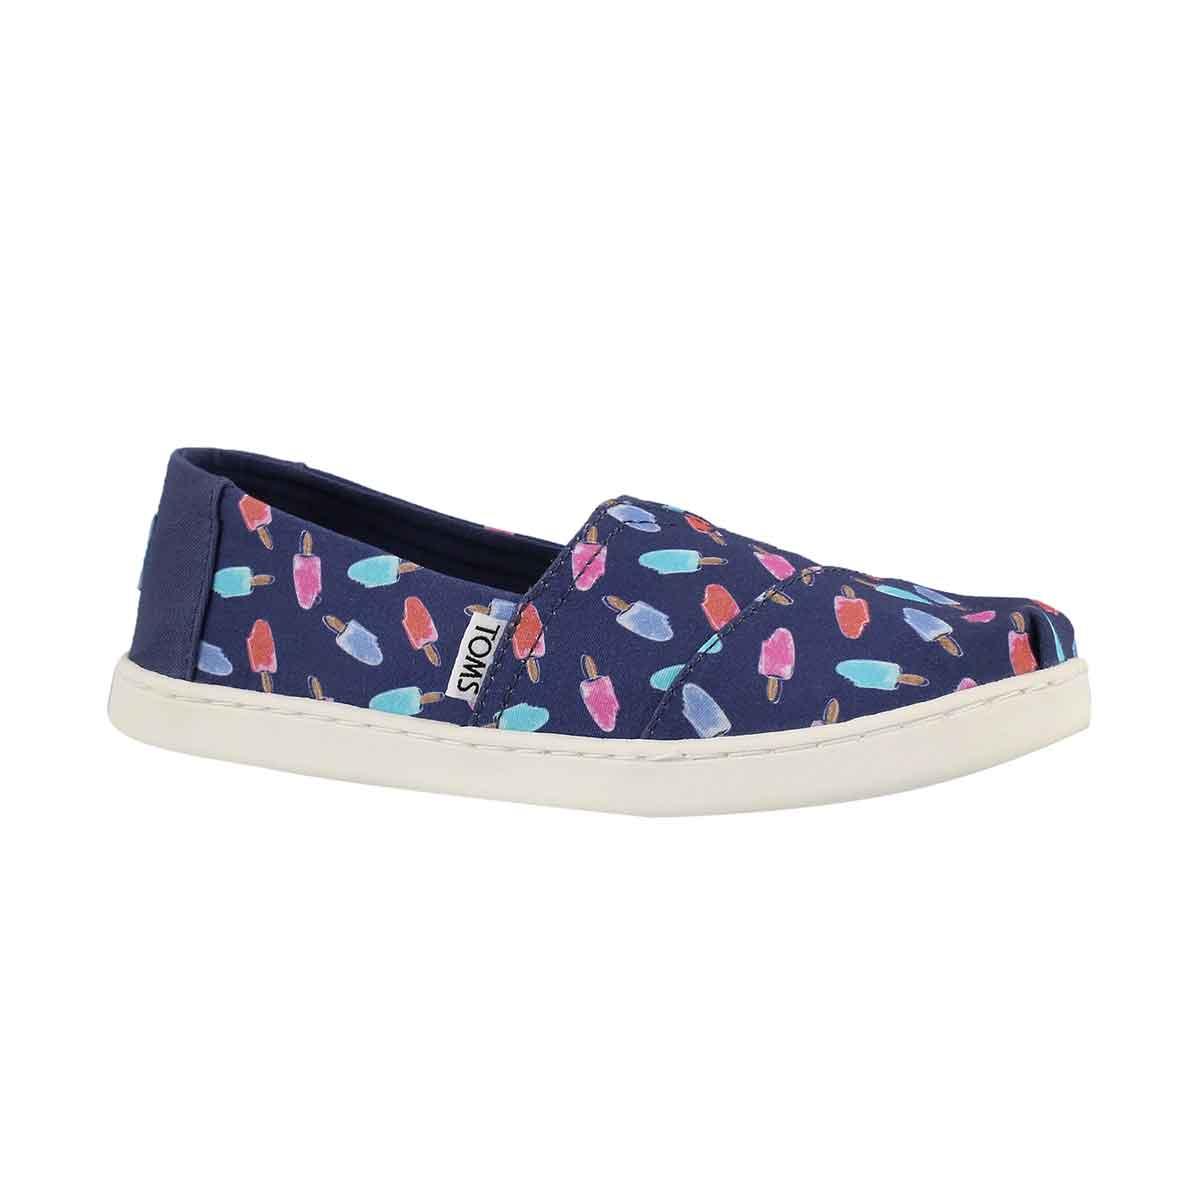 Grls Classic Ssnl cdt blu popscl loafer